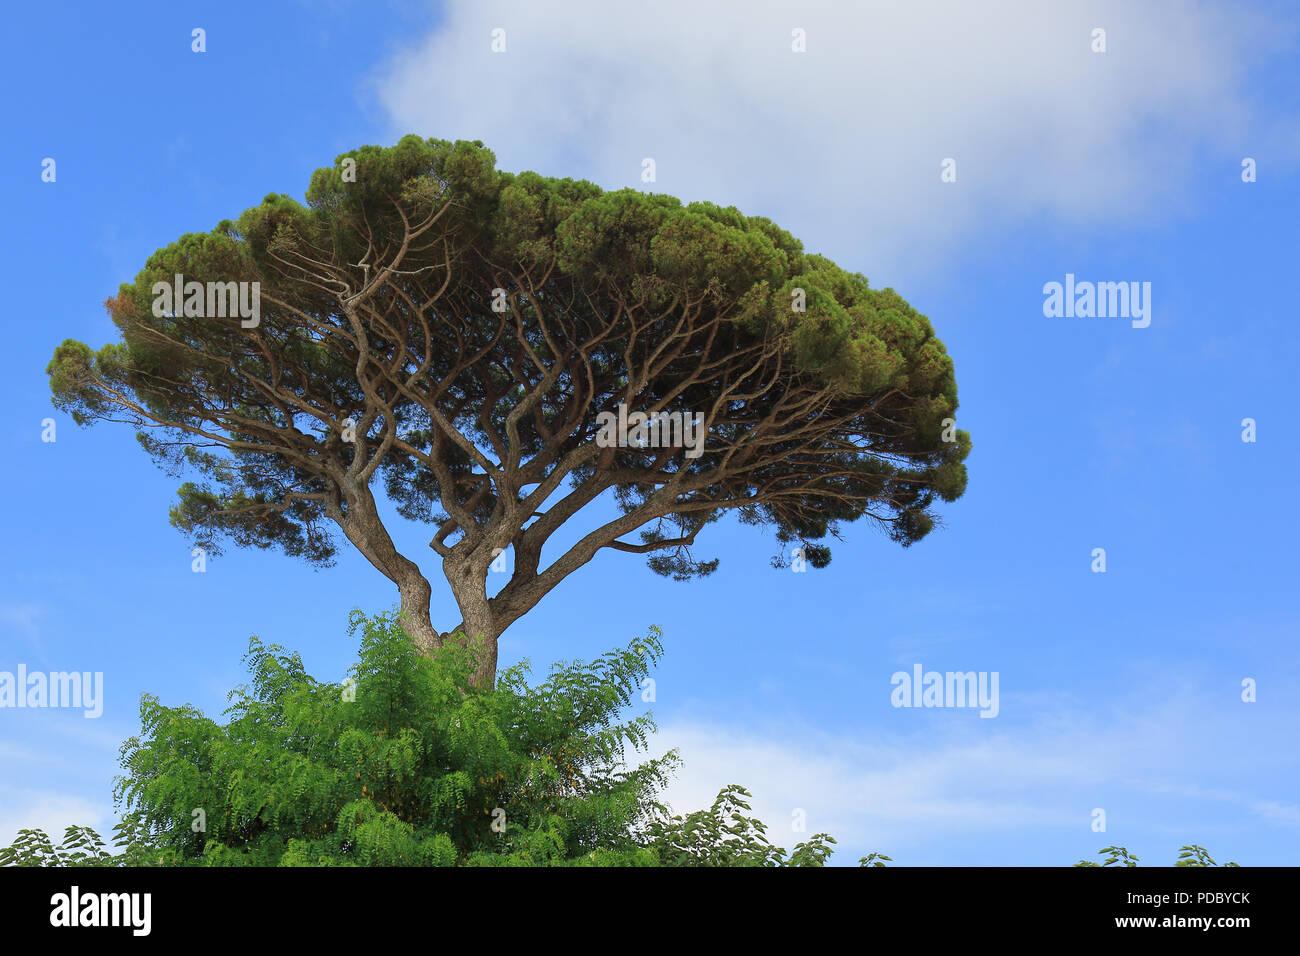 EVERGREEN CONIFER TREE or Umbrella Pine PINUS PINEA plant EDIBLE SEEDS